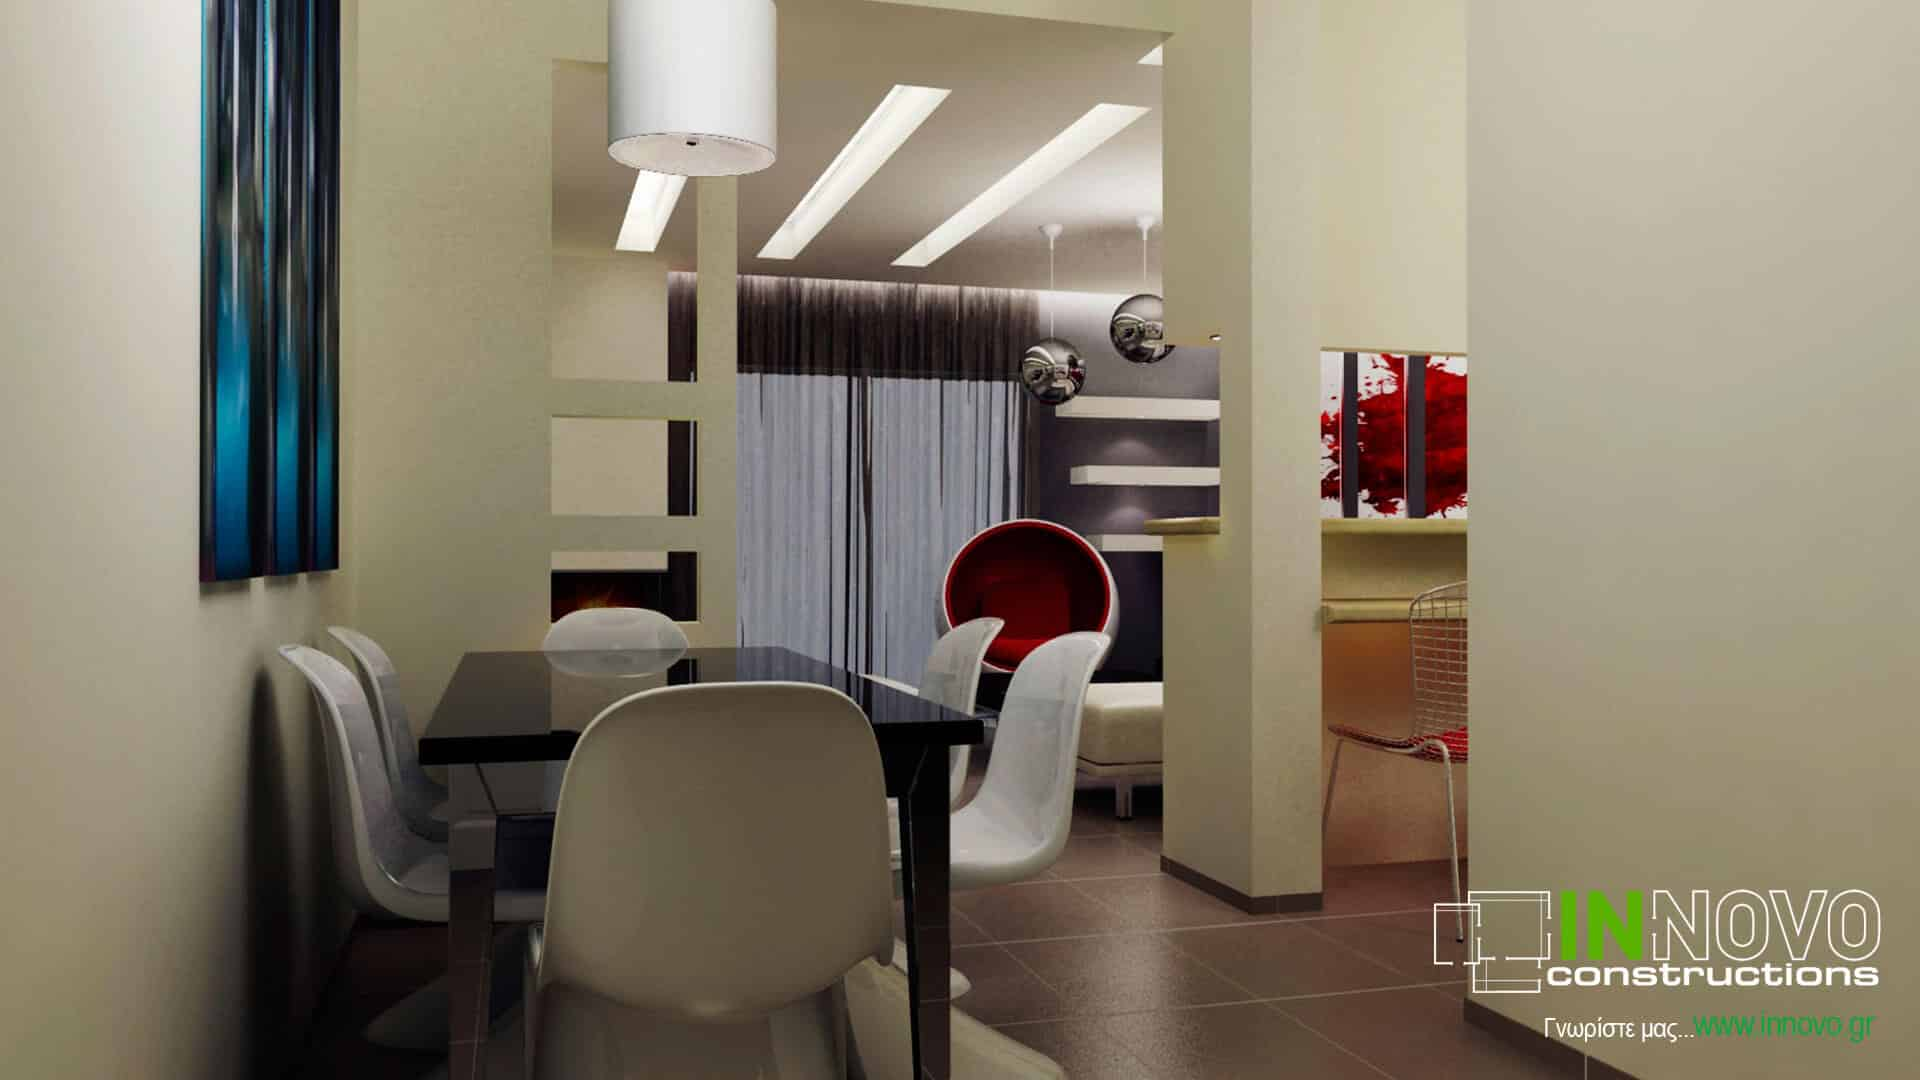 anakainisi-oikias-house-renovation-spiti-renti-1180-8